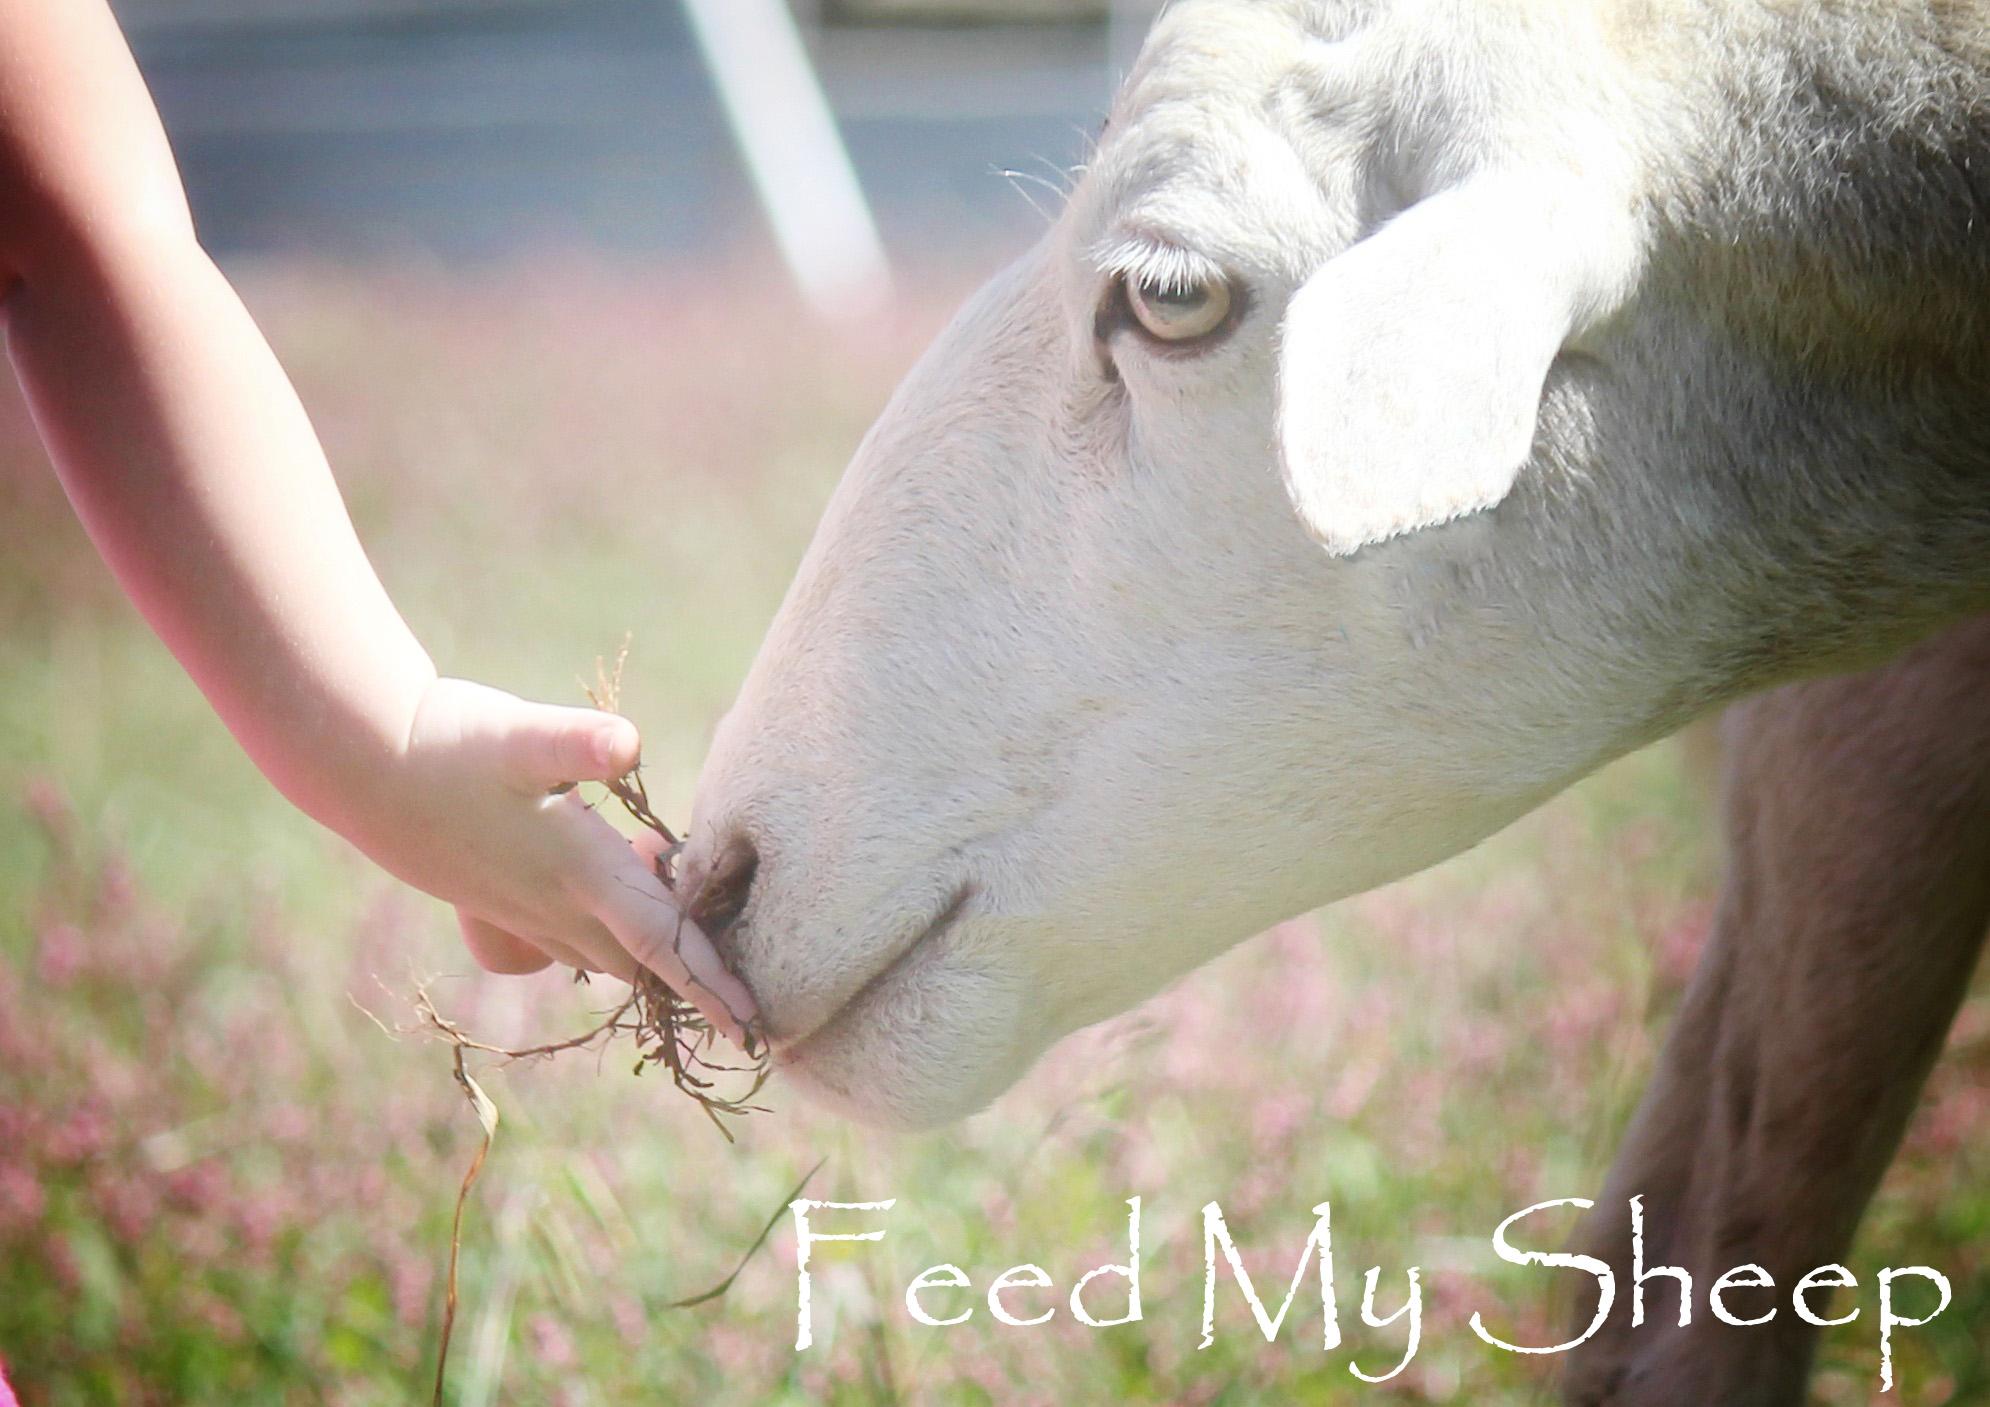 feedsheepccc